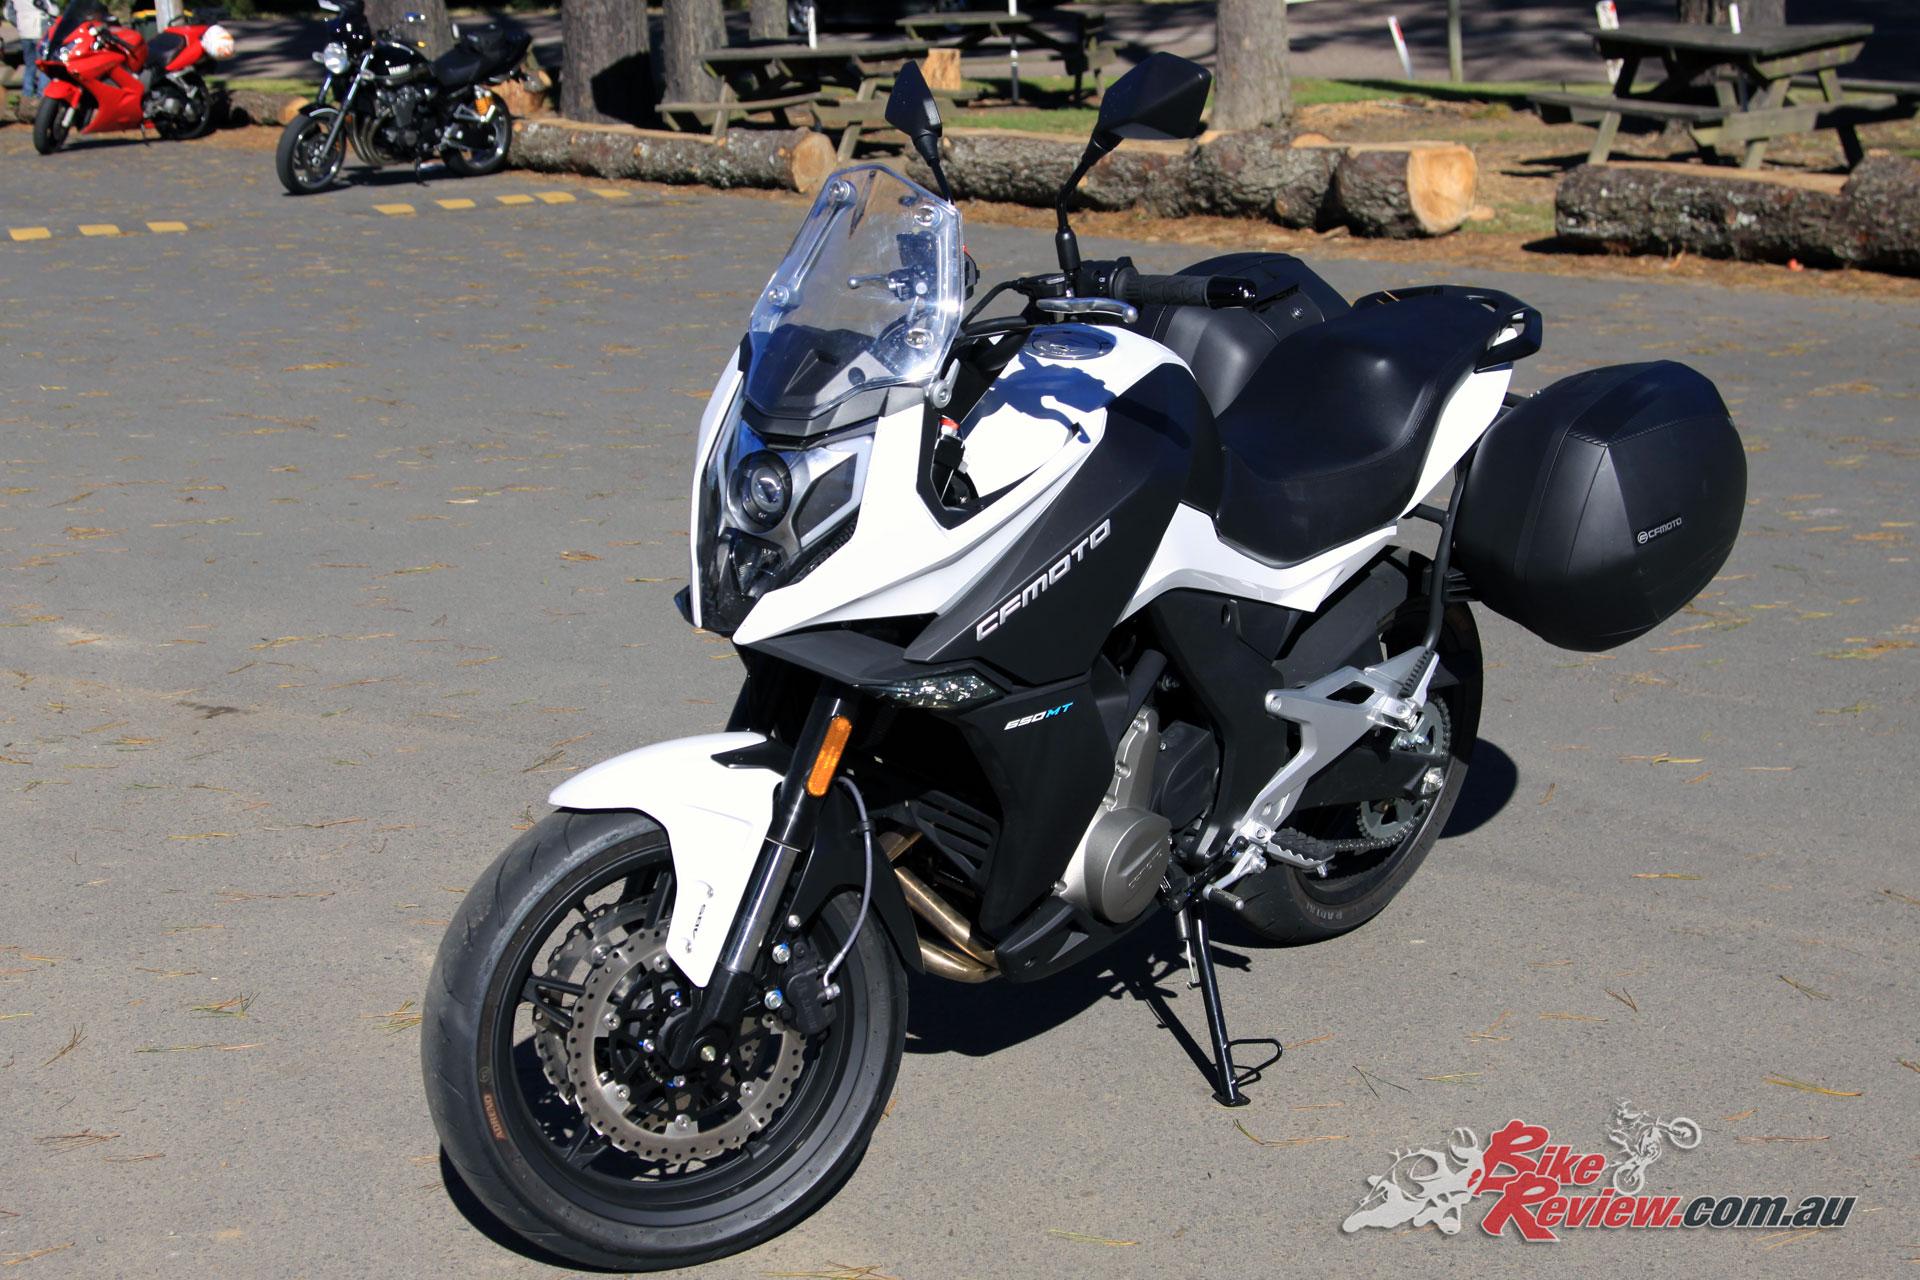 Review: 2017 CFMoto 650MT - Bike Review